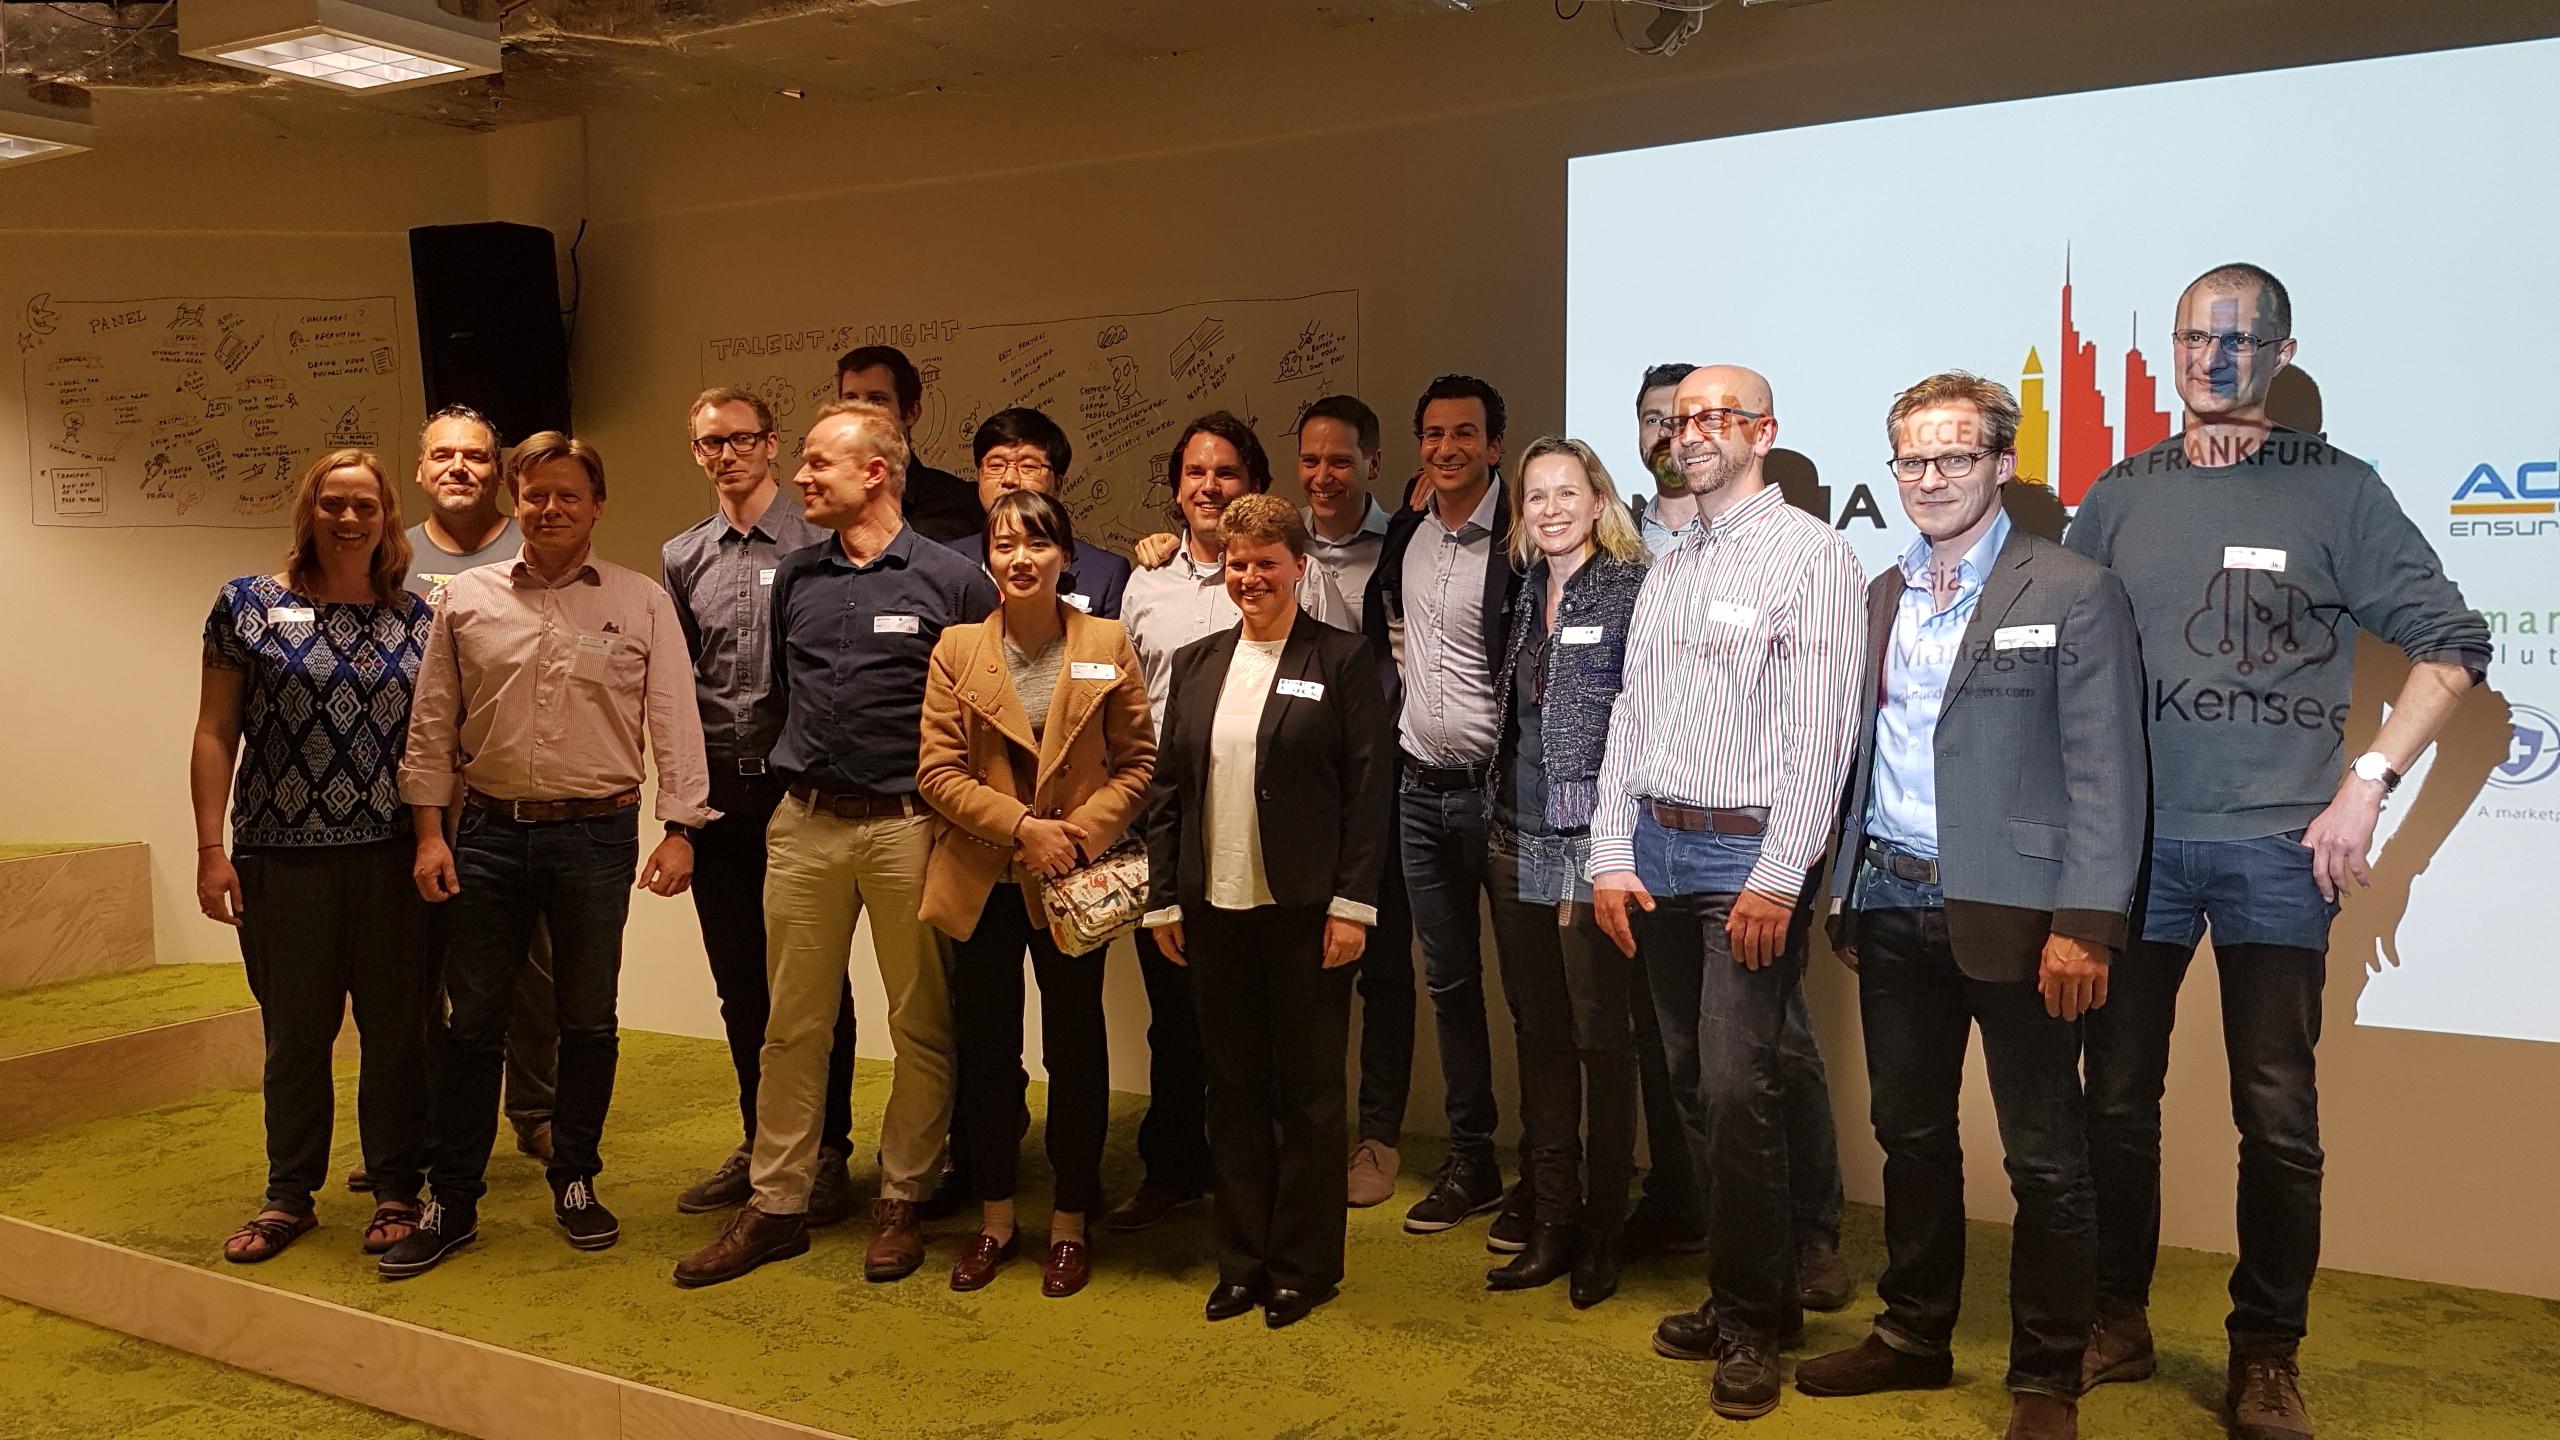 http://www.acceleratorfrankfurt.com/wp-content/uploads/2017/04/wave-2-group-picture.jpg